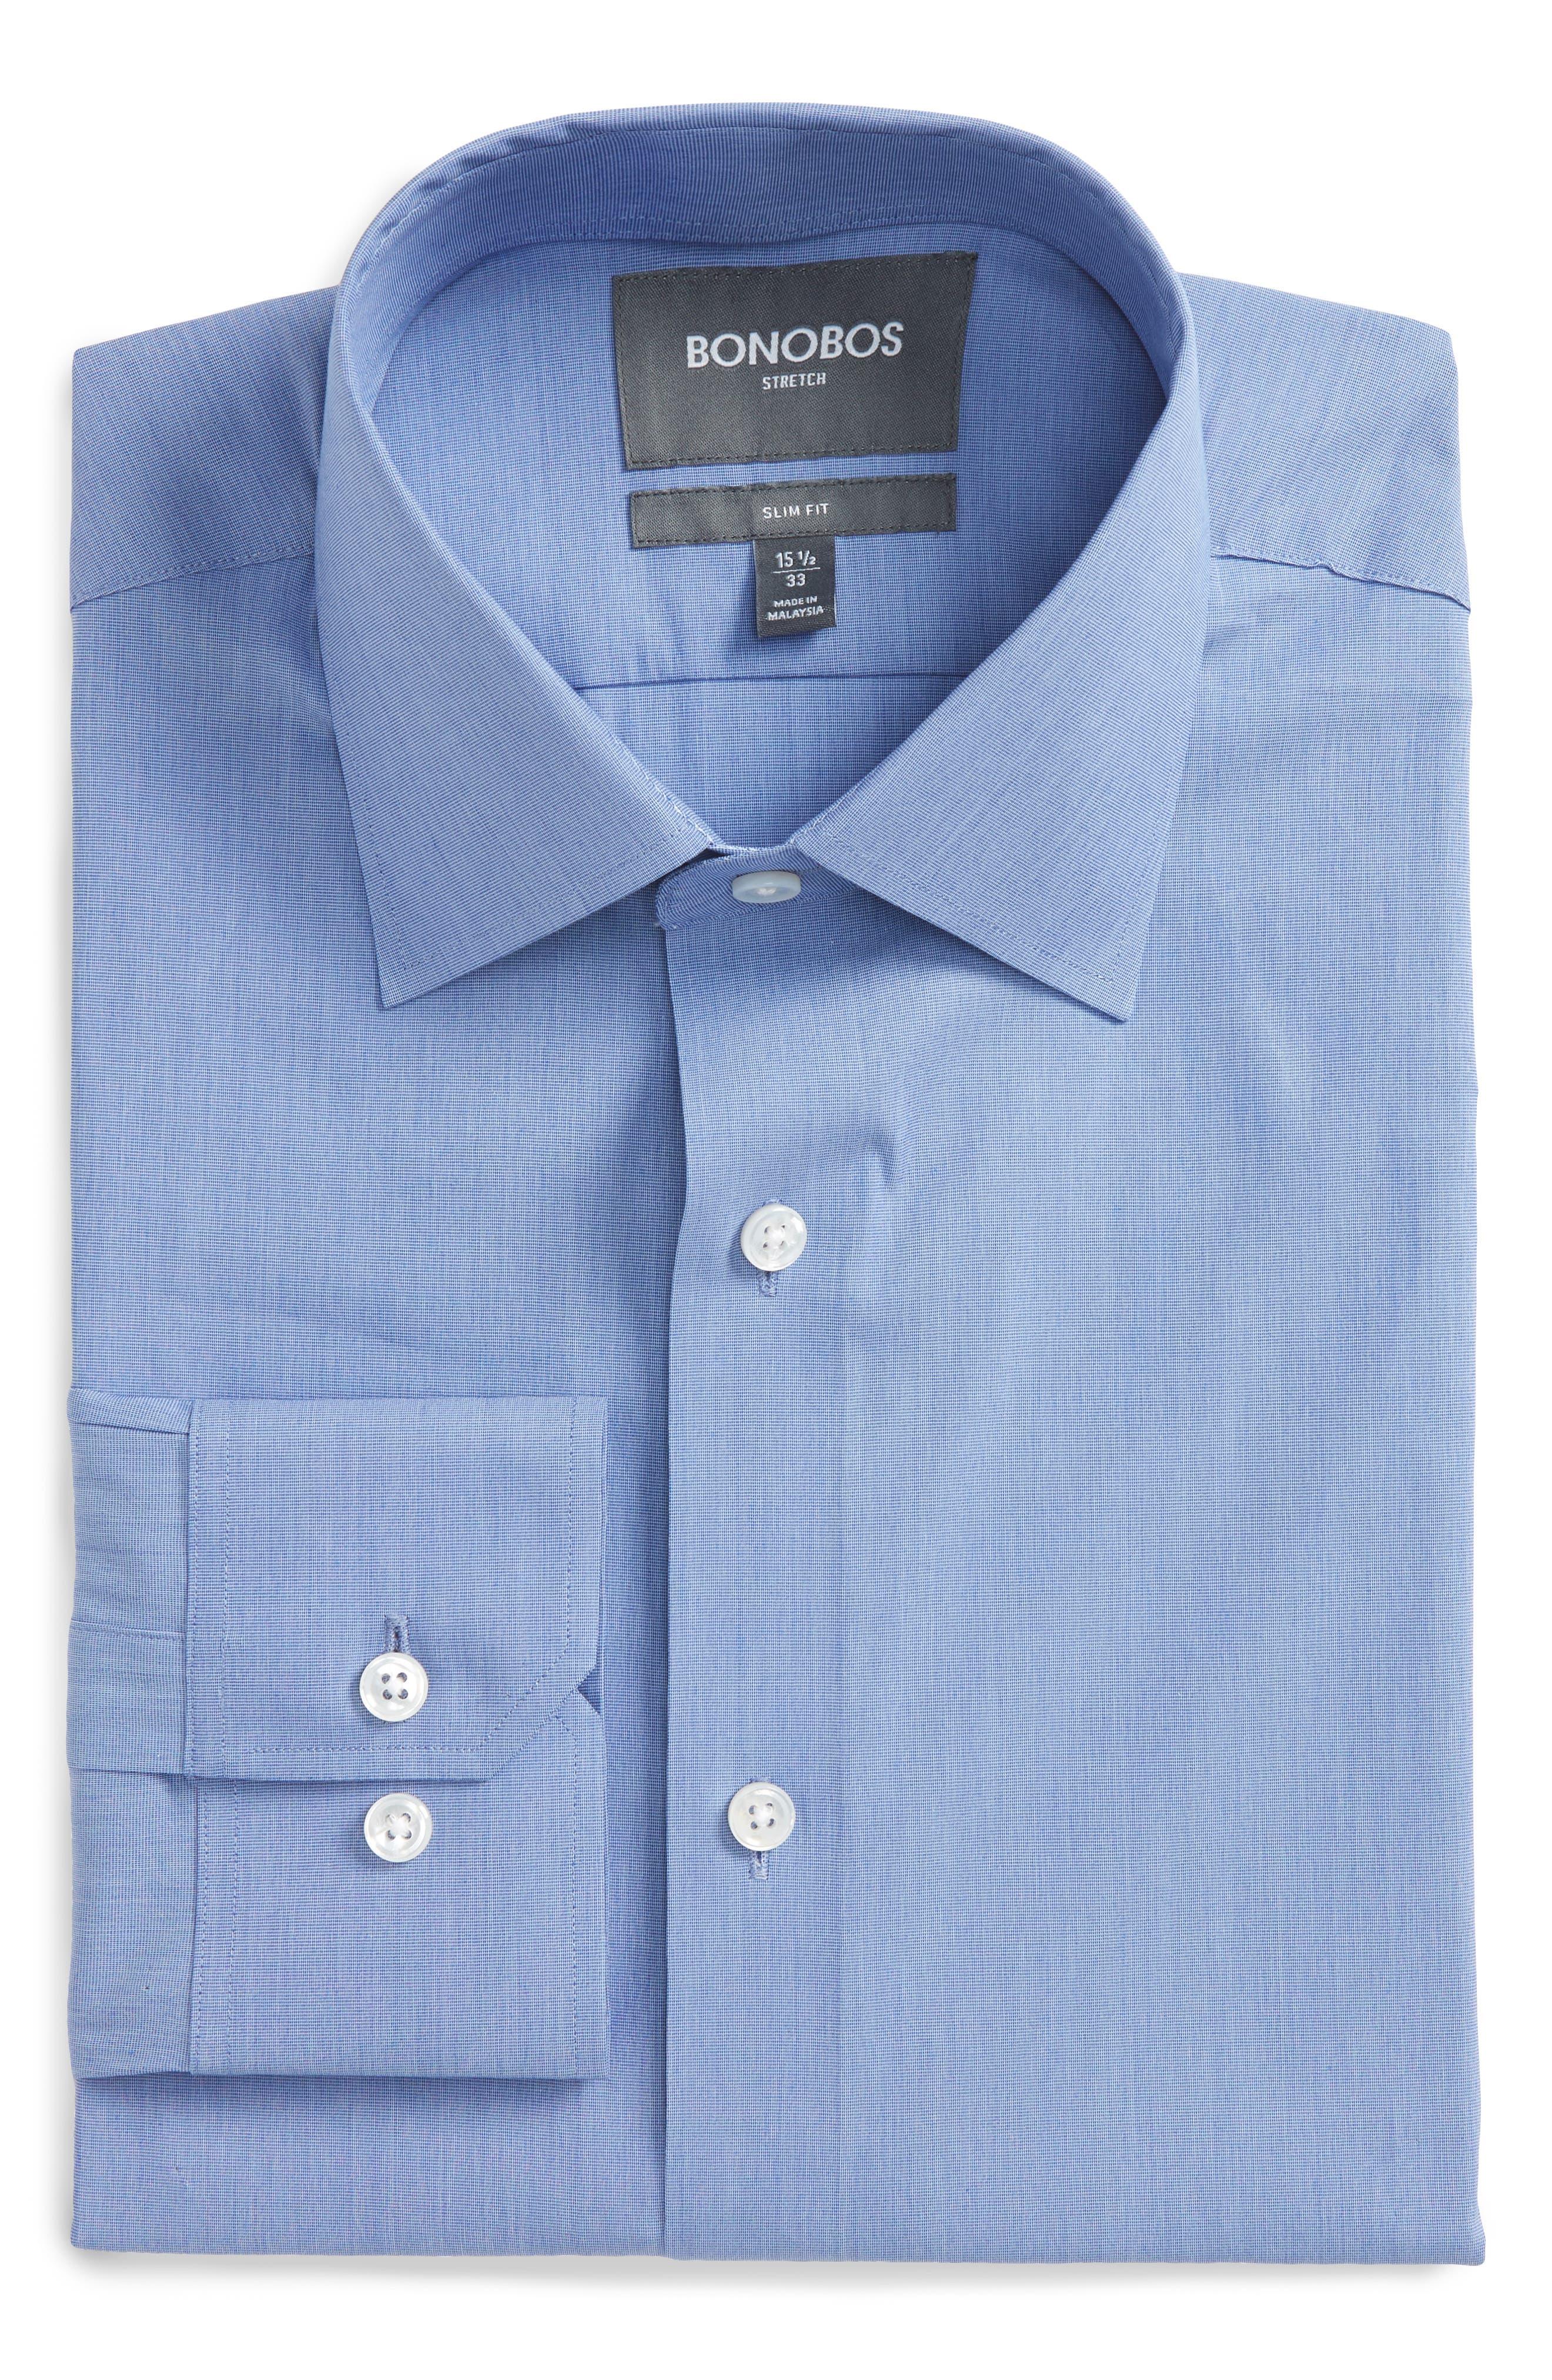 Jetsetter Slim Fit Solid Dress Shirt,                             Main thumbnail 1, color,                             Navy